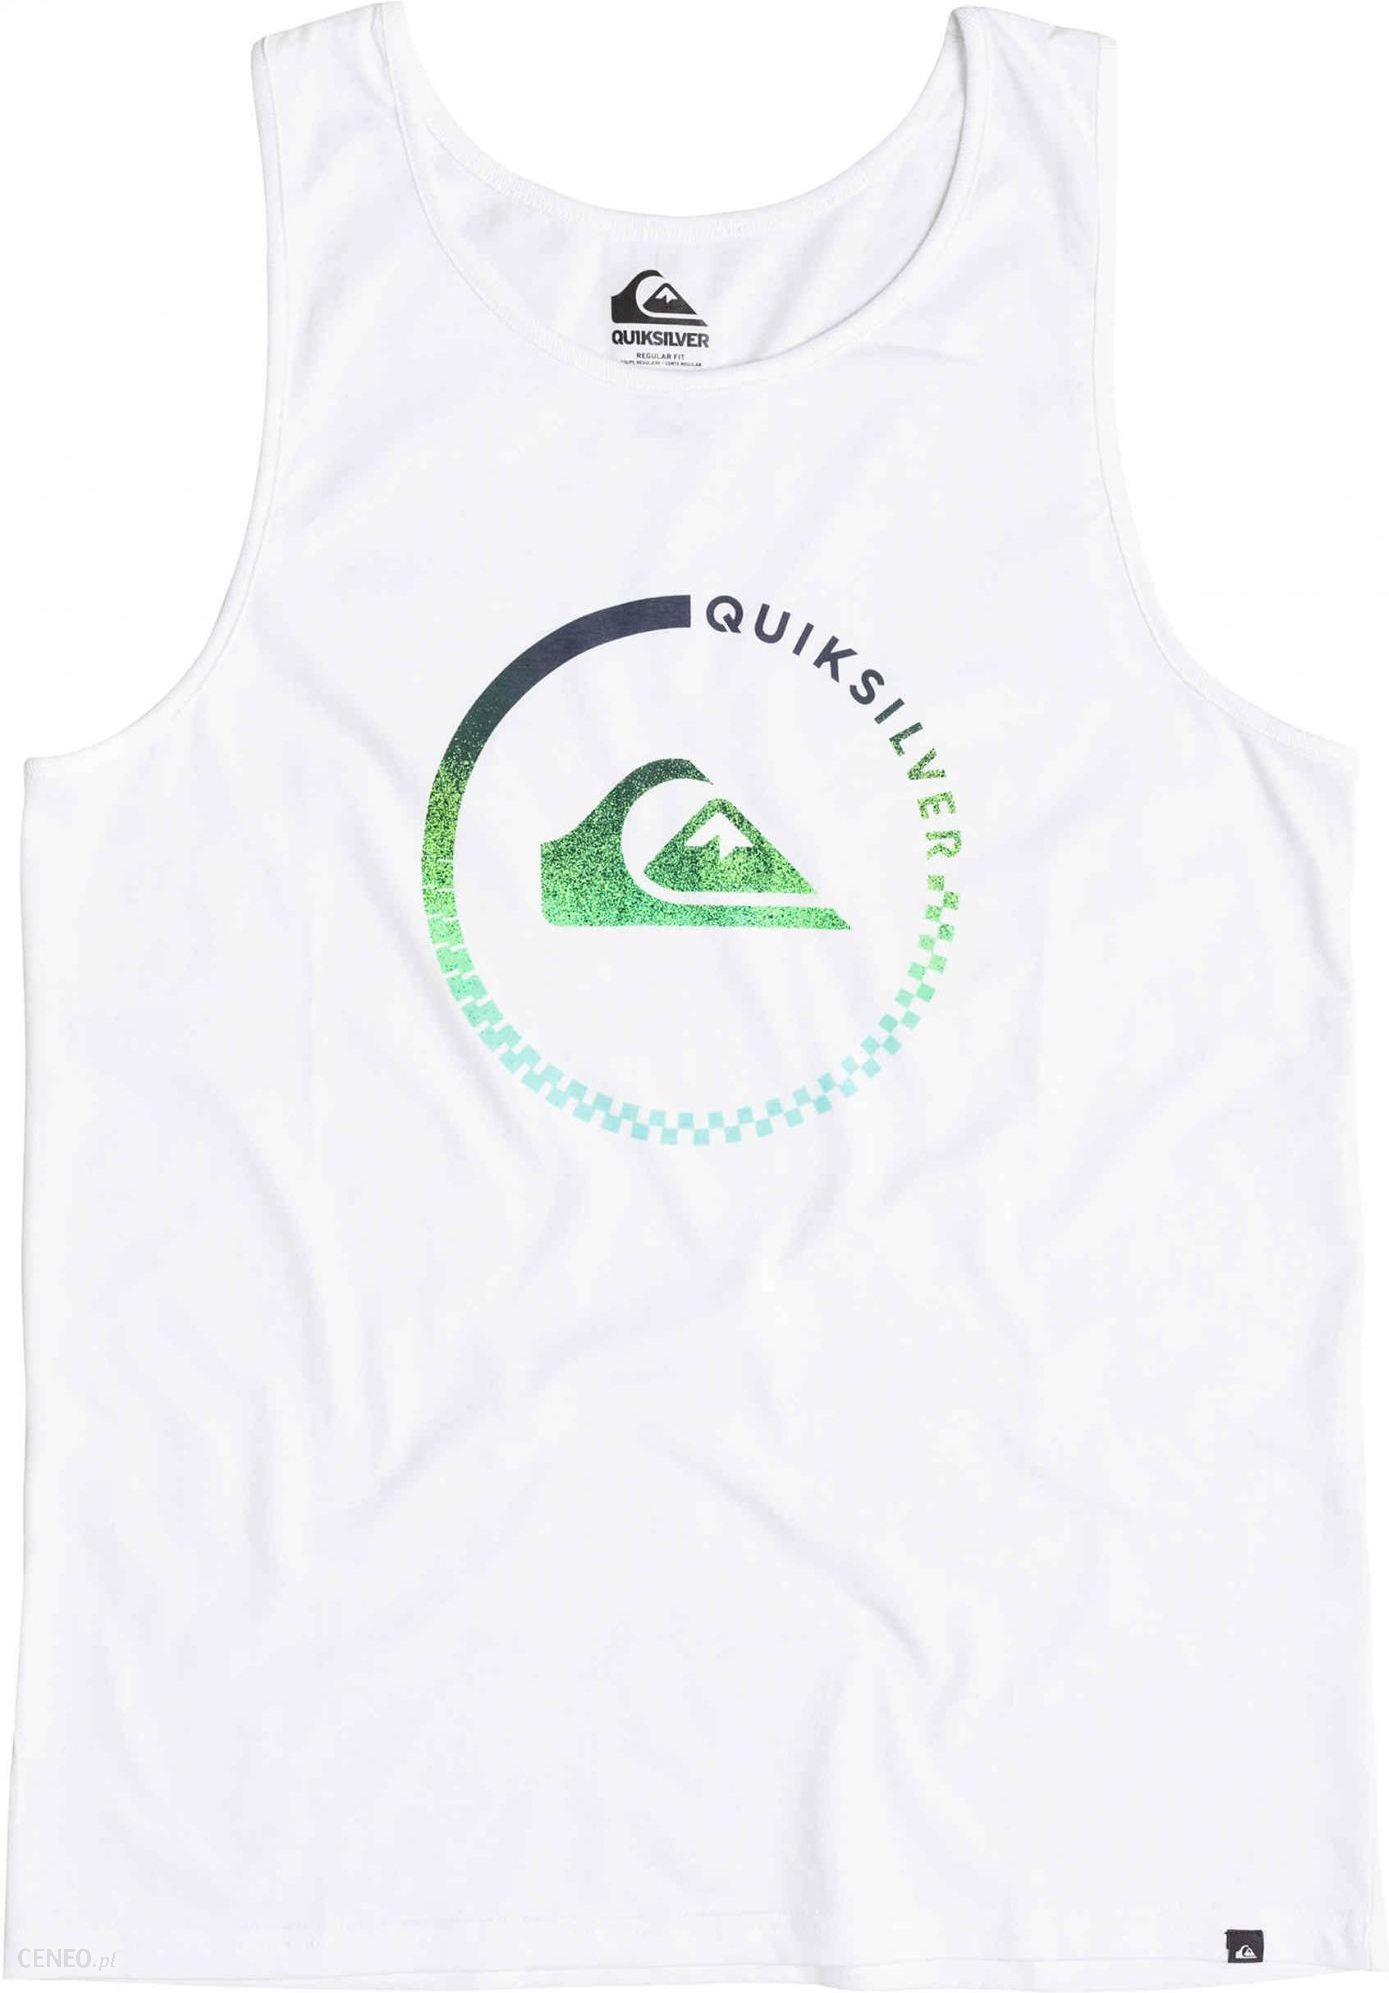 24b60a58335cb9 Quiksilver koszulka Classic Everyday Active M Tees White - Ceny i ...